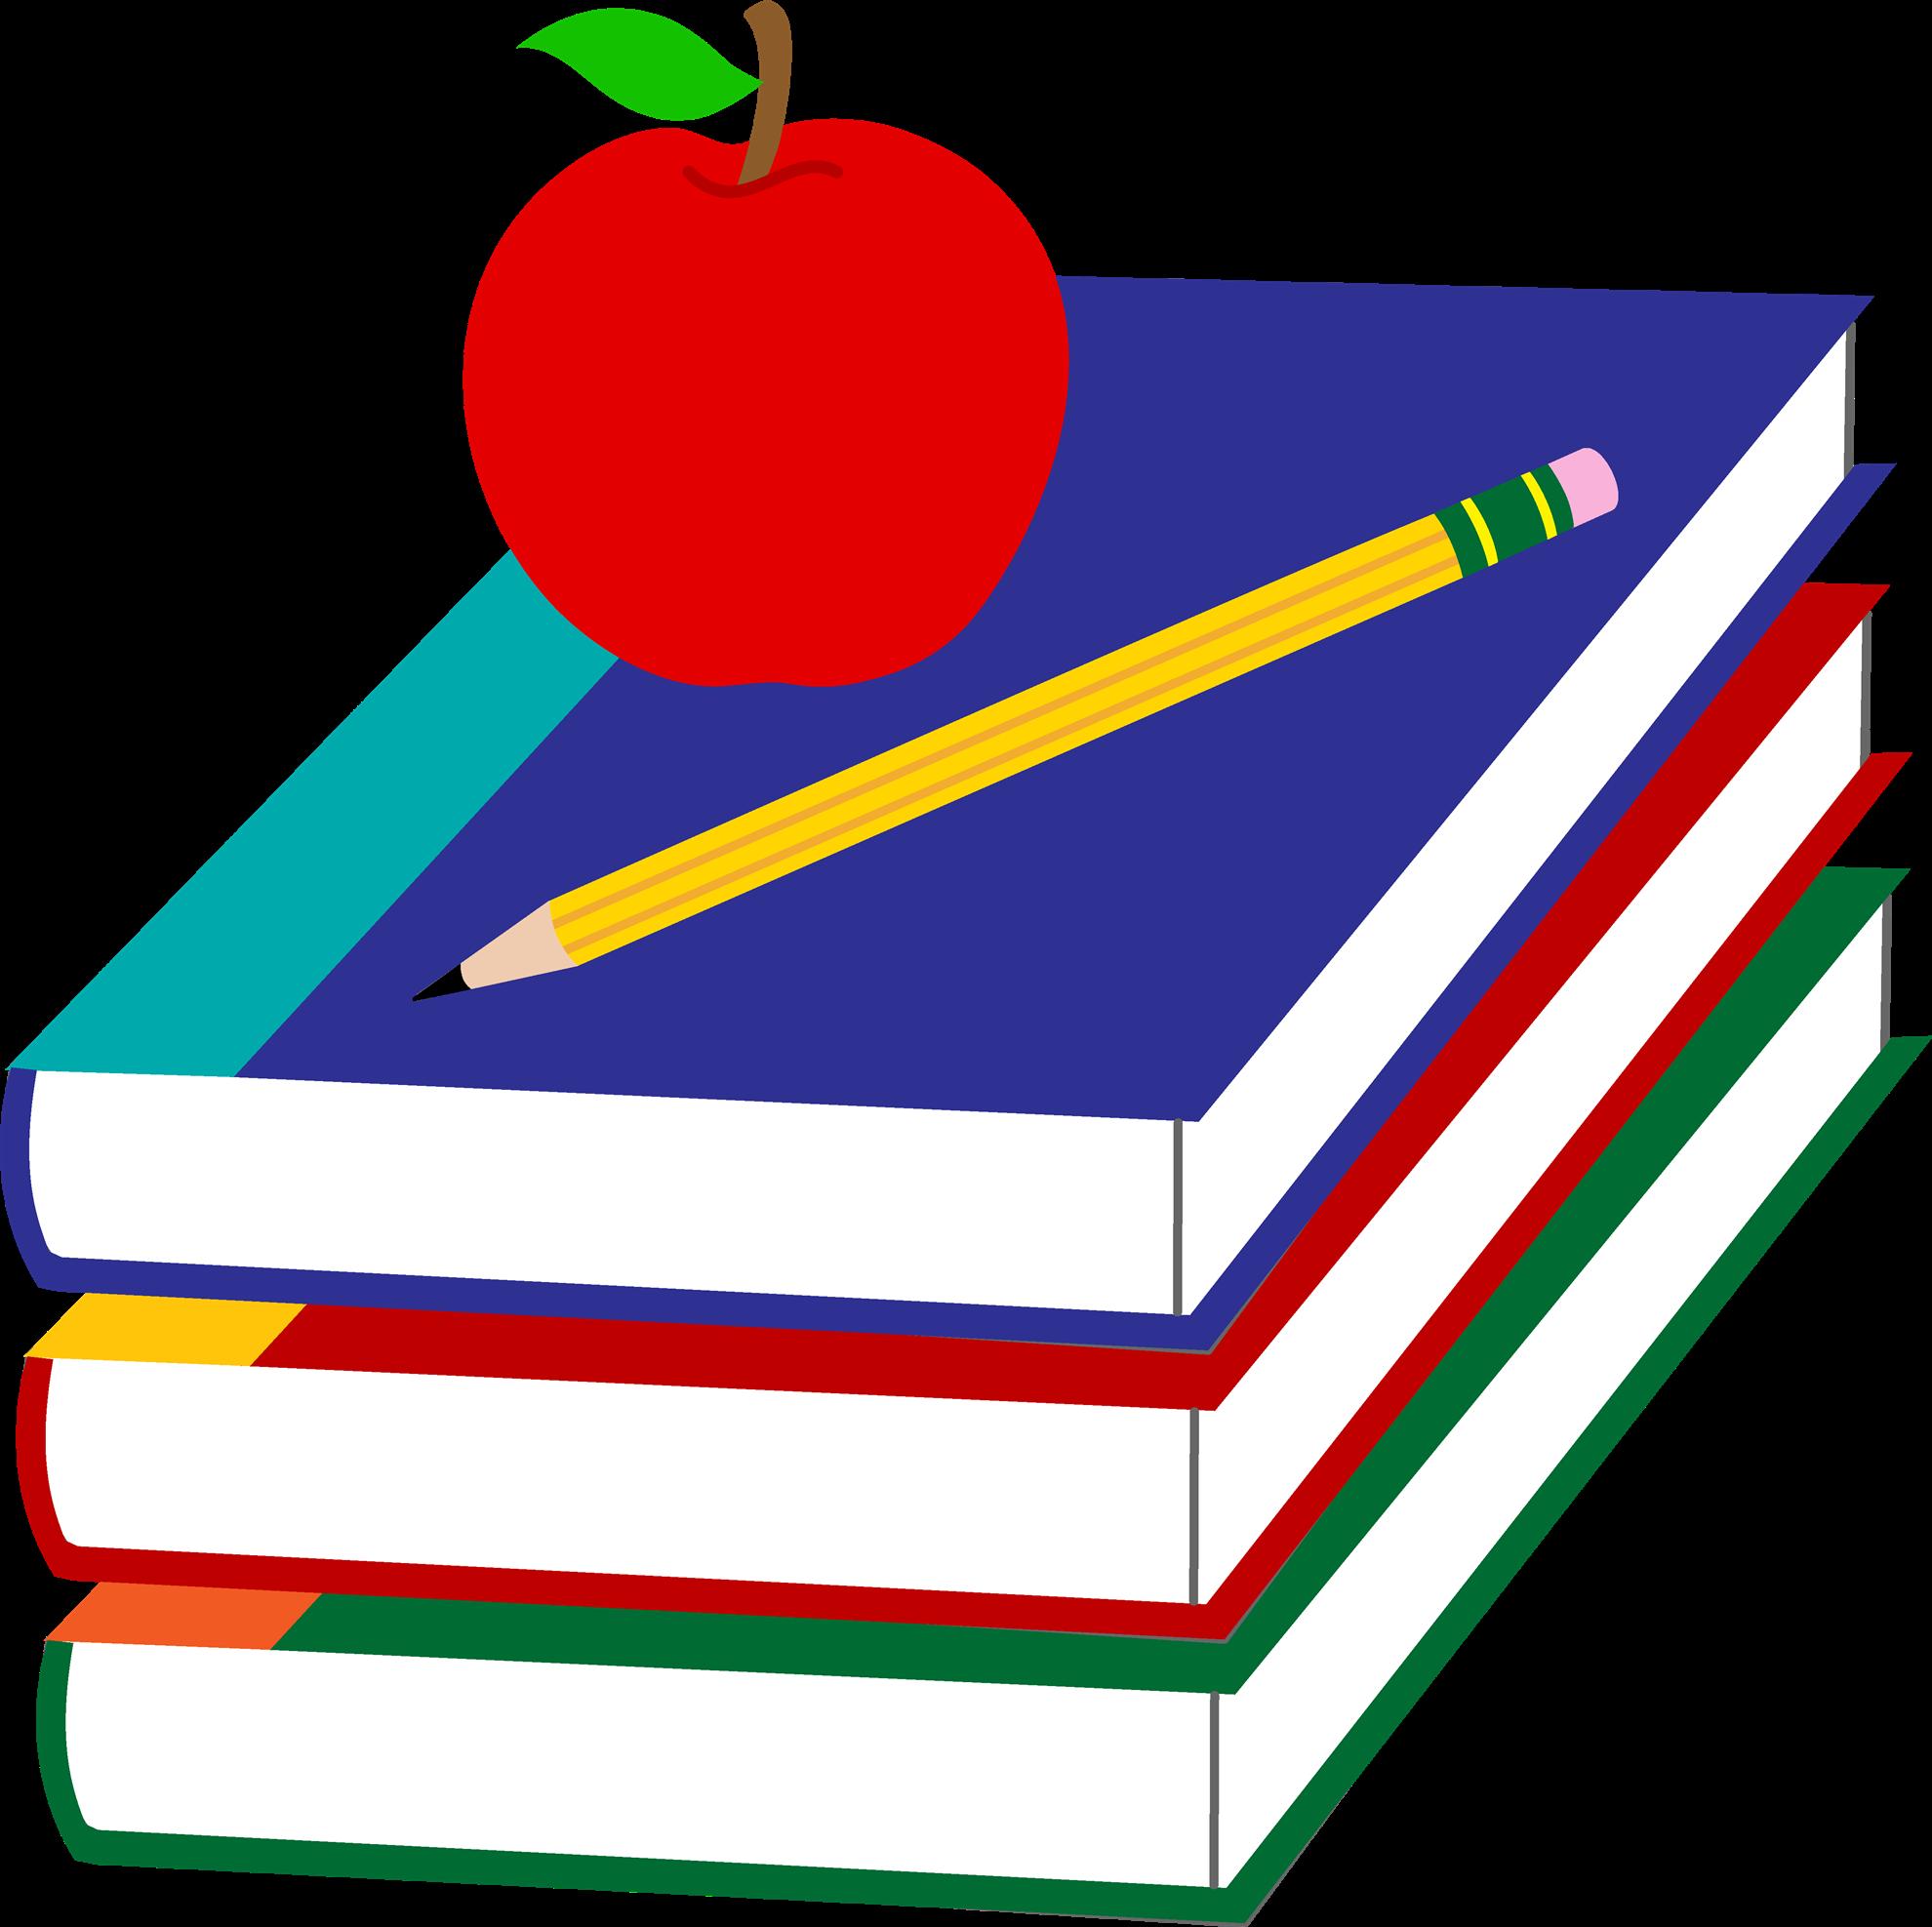 Glitter apple clipart svg free learnportwiki14 / Computer Class Extraordinaire! svg free